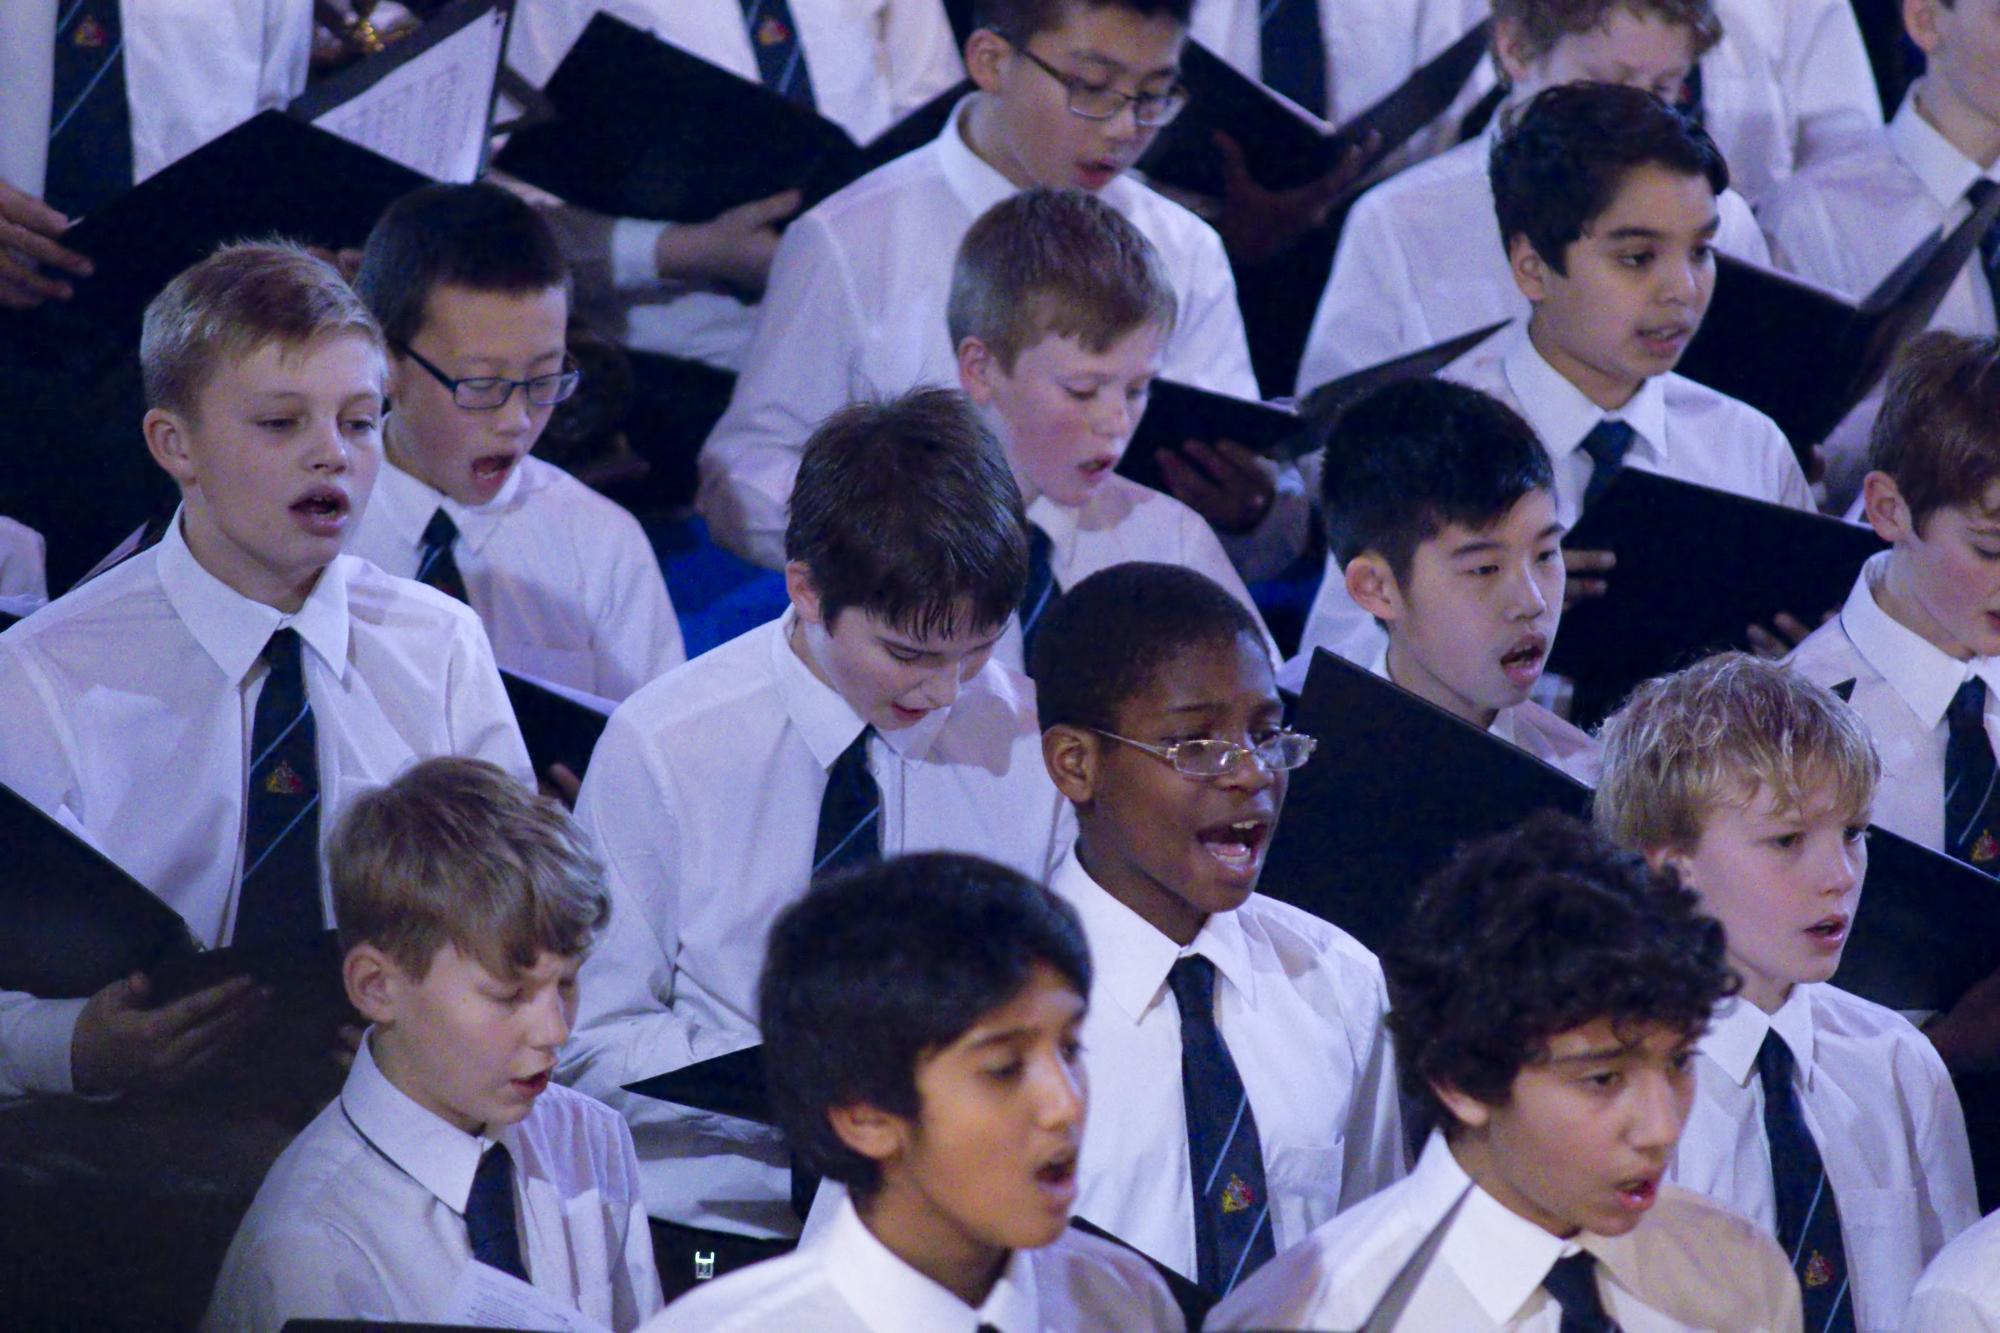 King Edward's School, music department, KES Choir, Carol Service (2)